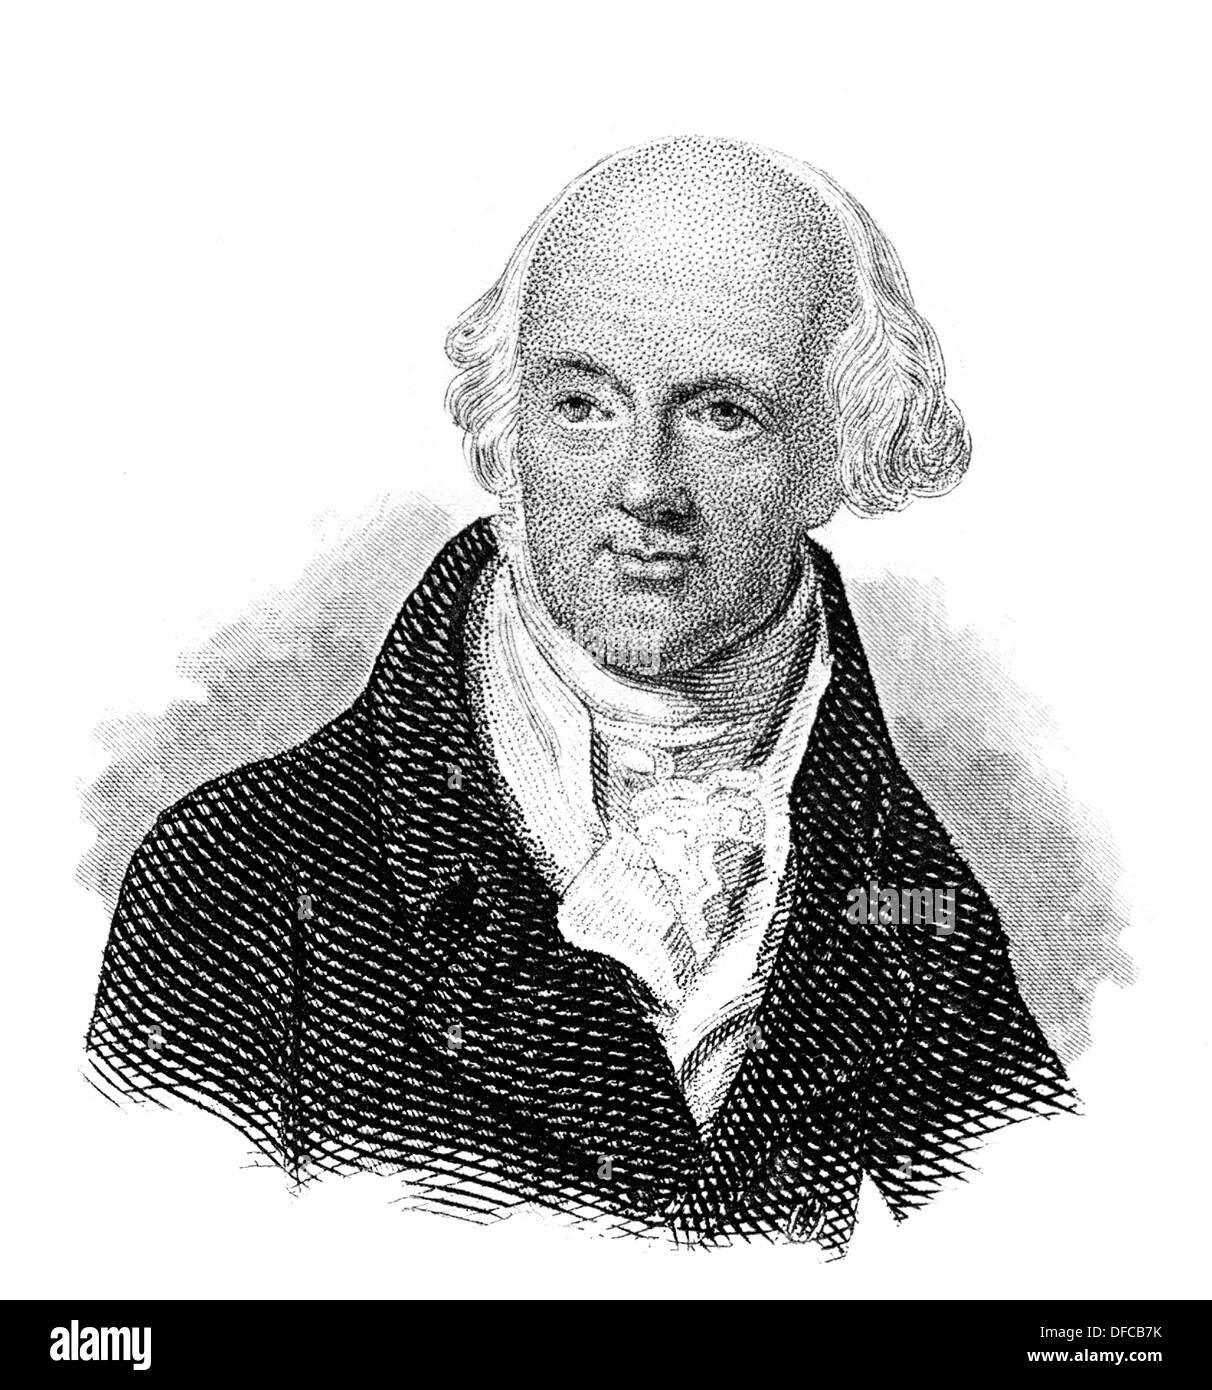 A biography of david hume a scottish philosopher historian economist and essayist